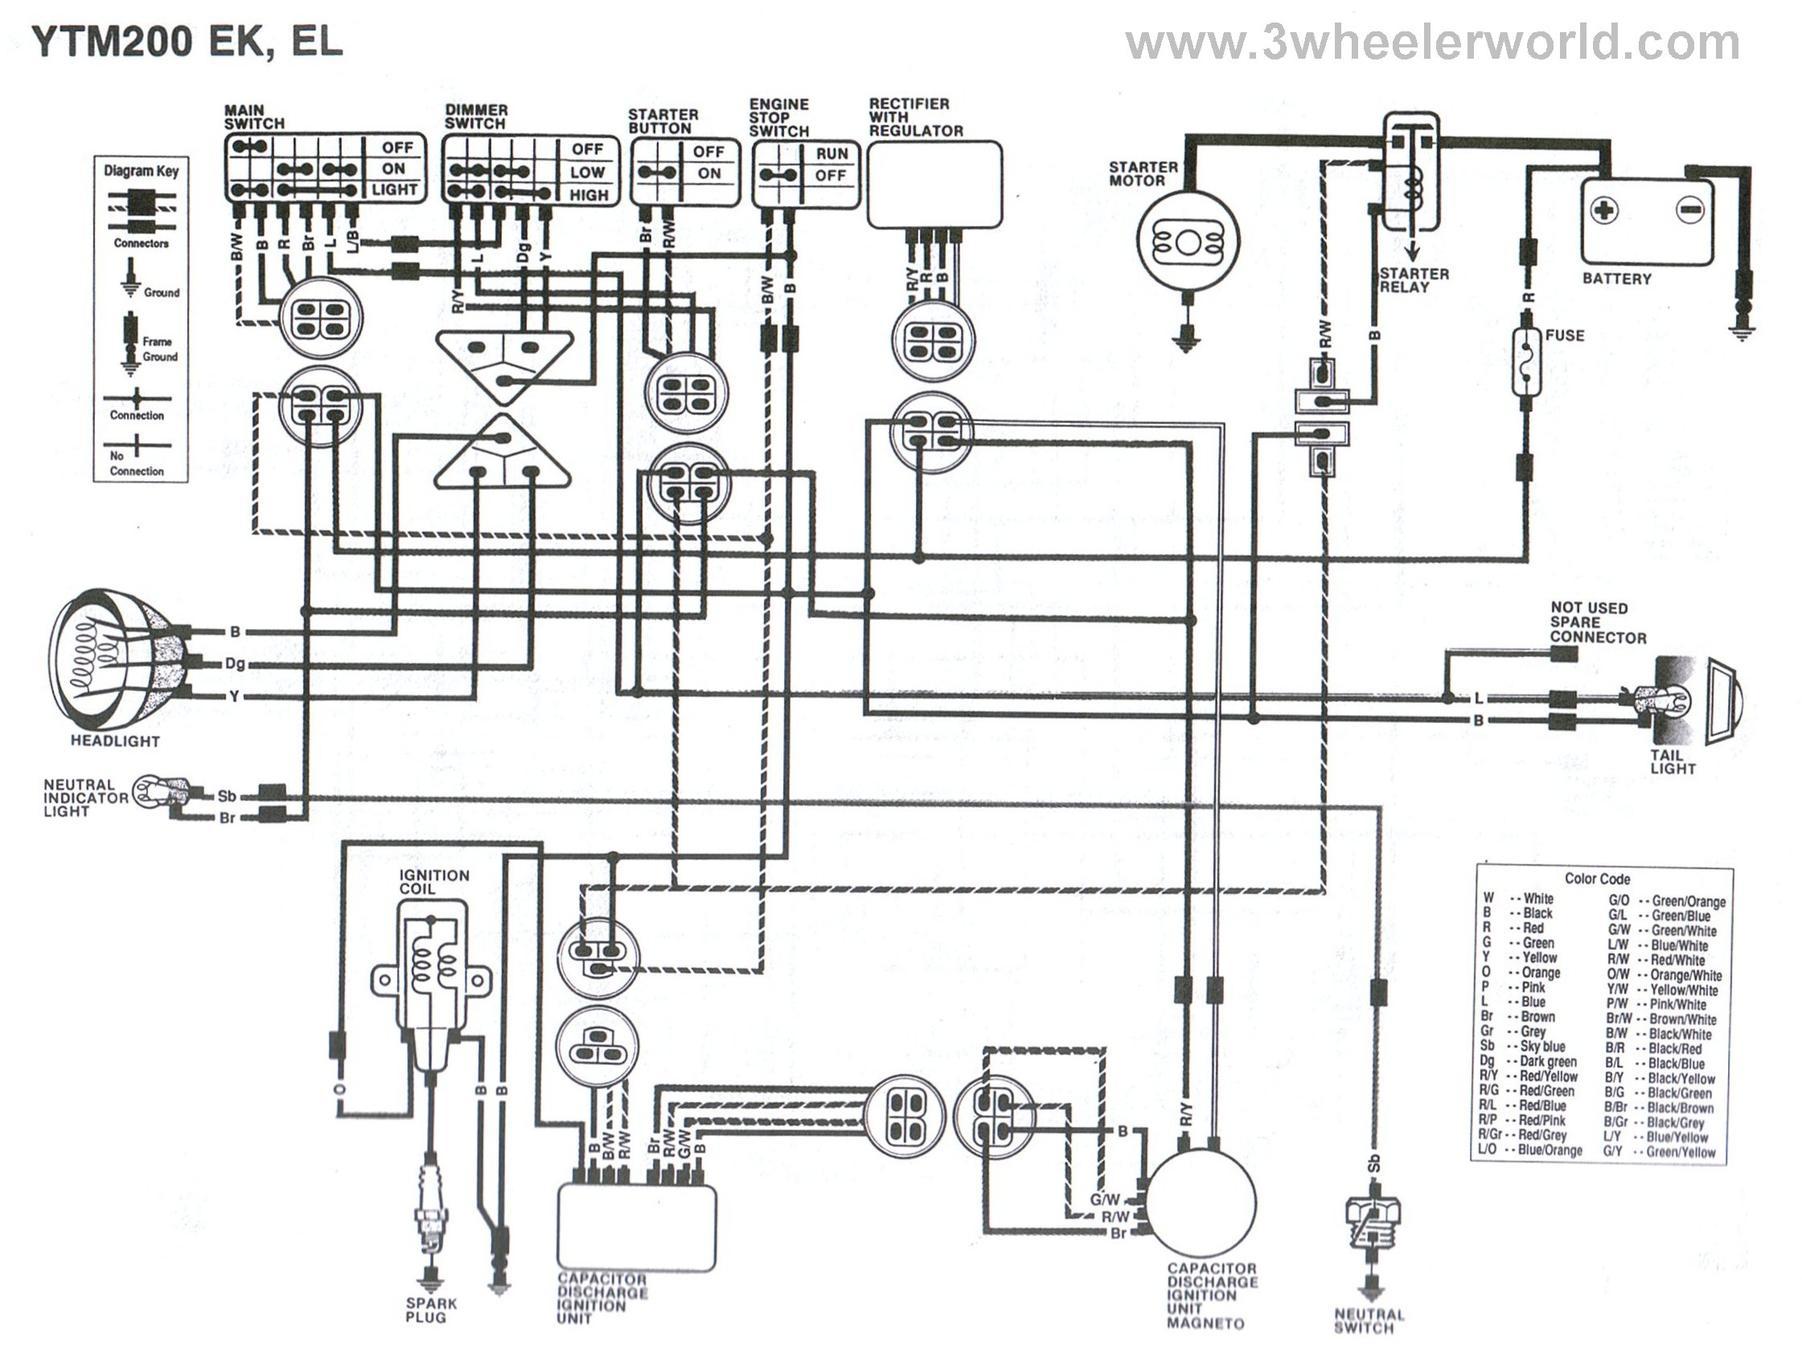 Funky Honda Trx420fm Wiring Diagram Component - Wiring Standart ...